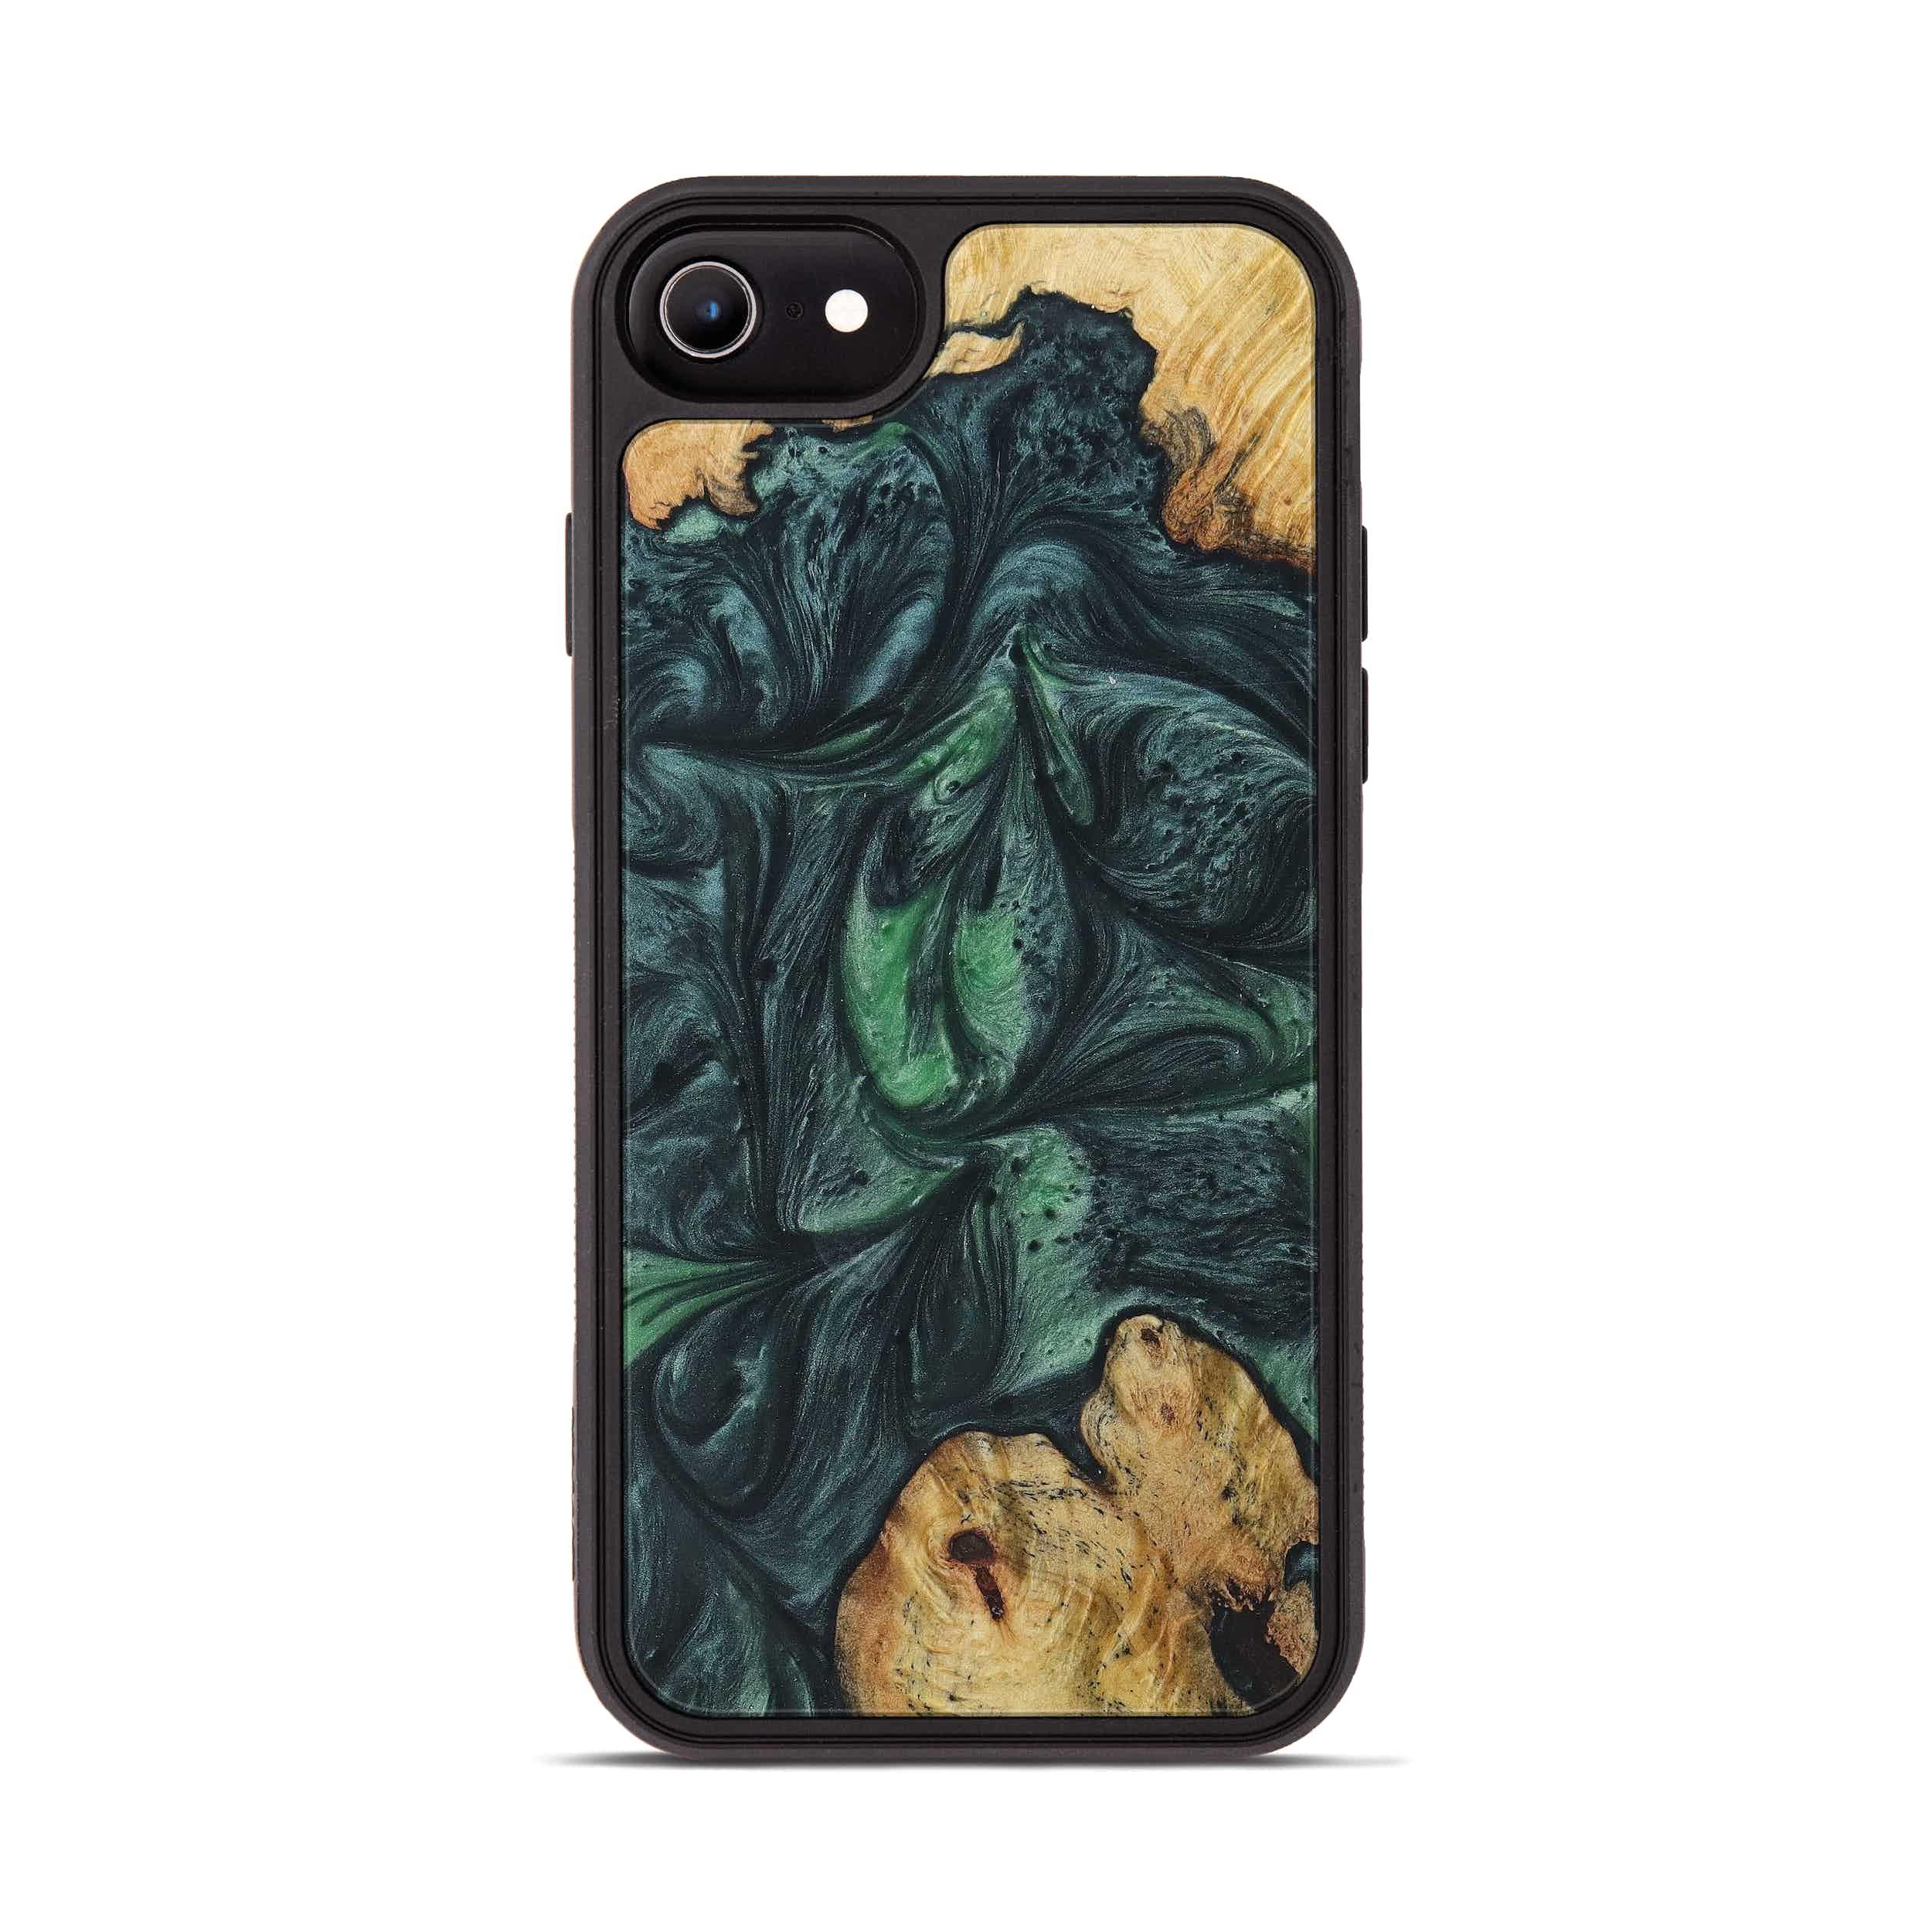 iPhone 6s Wood+Resin Phone Case - Lib (Dark Green, 394723)